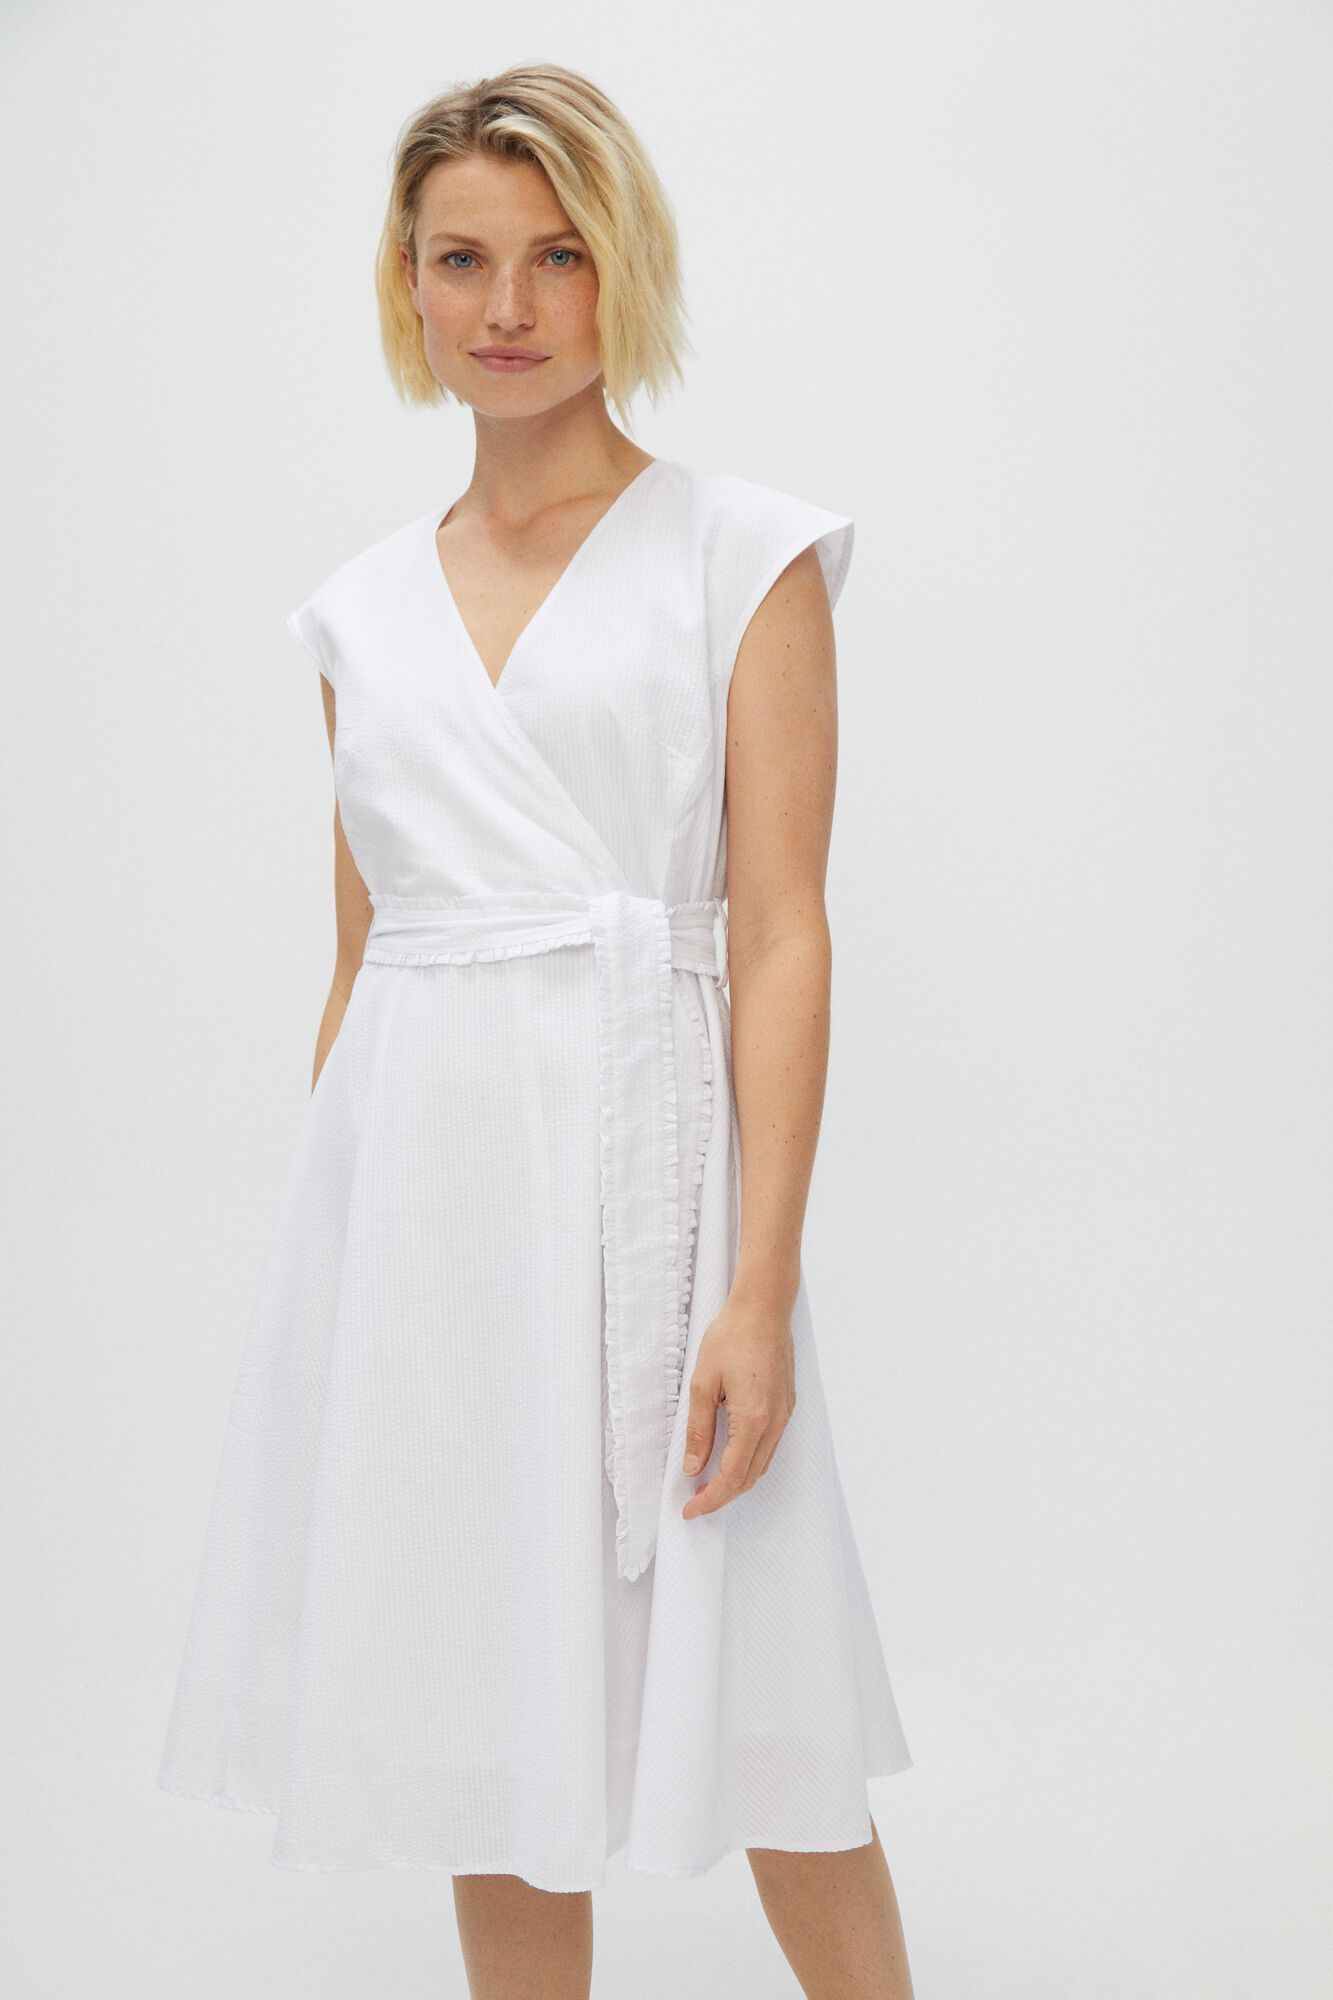 Vestido blanco manga corta